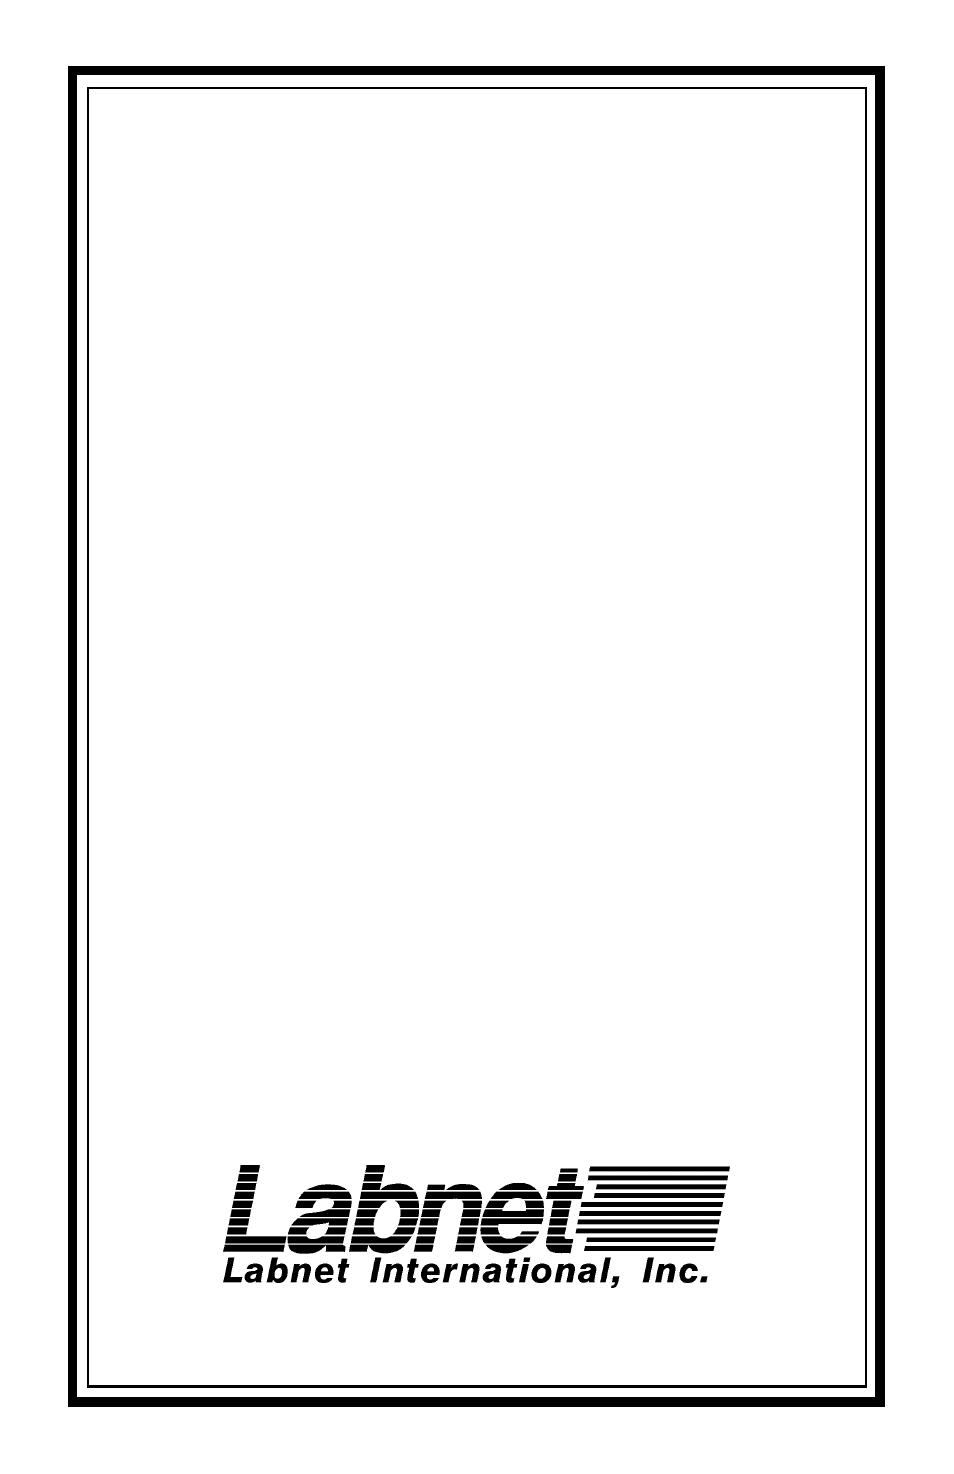 Labnet AccuBlock Digital Dry Baths (D1100 and D1200) User